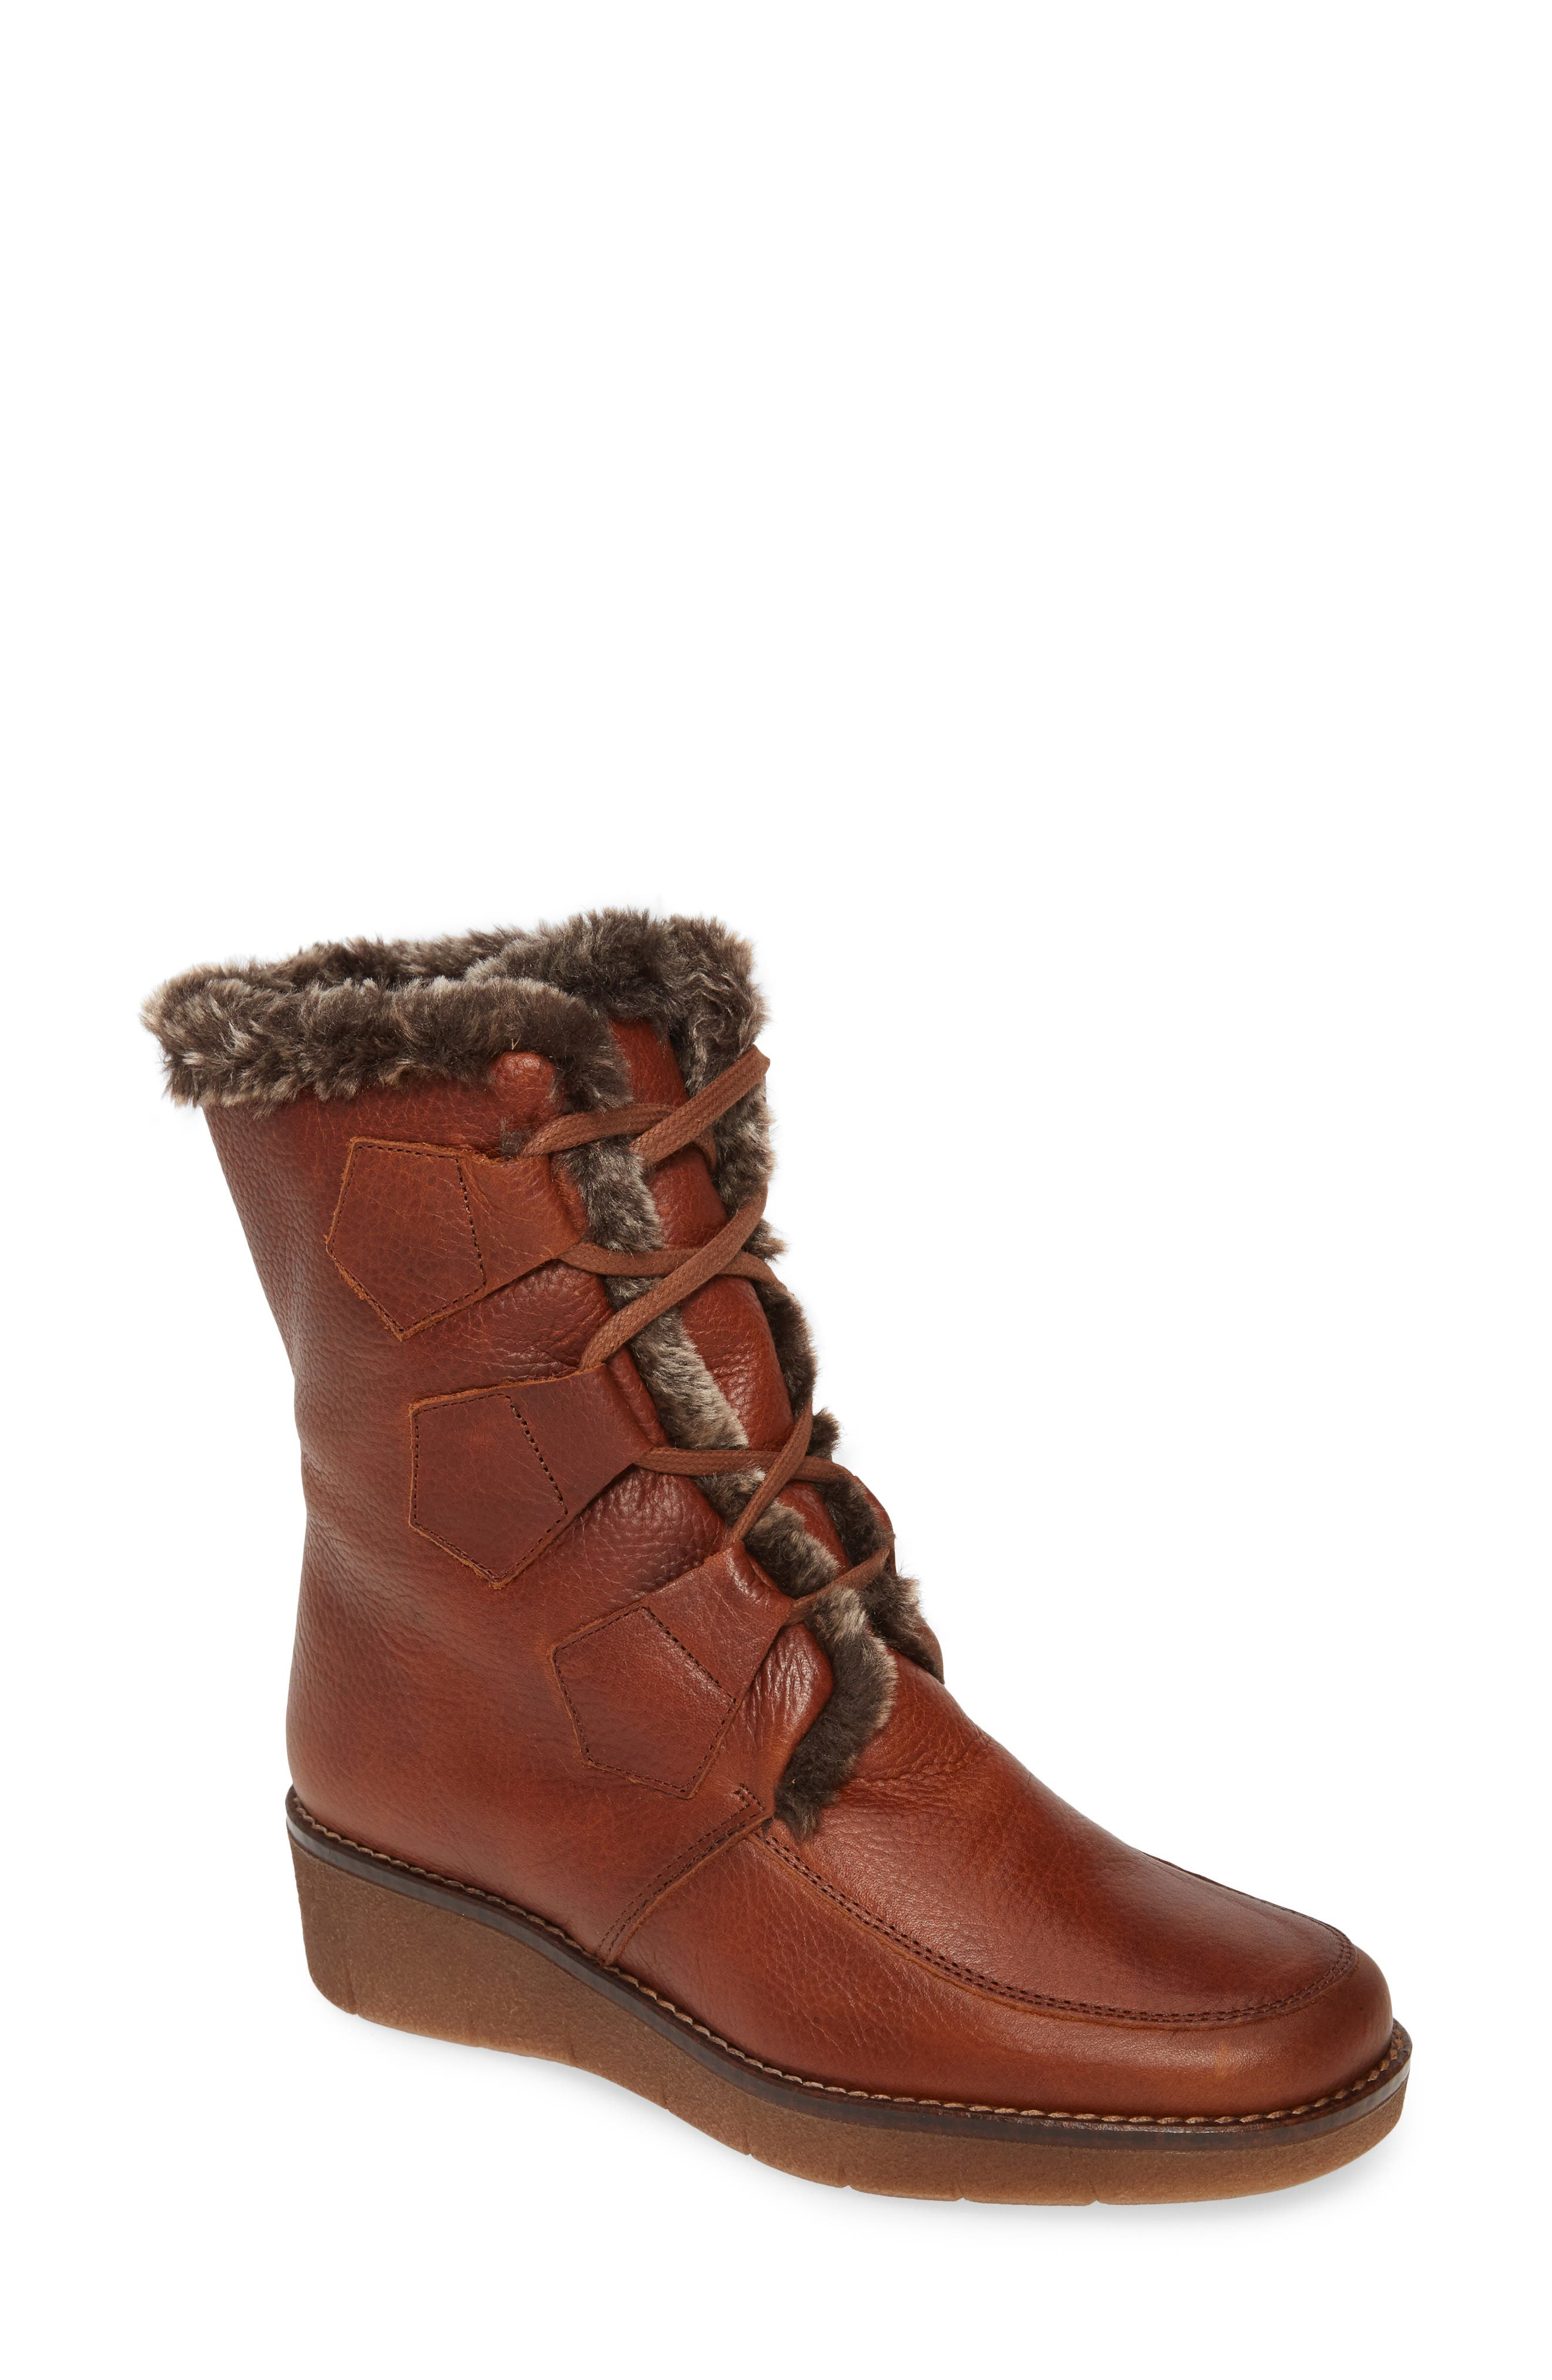 1940s Style Shoes, 40s Shoes Womens Toni Pons Ador Faux Fur Lined Bootie $258.95 AT vintagedancer.com